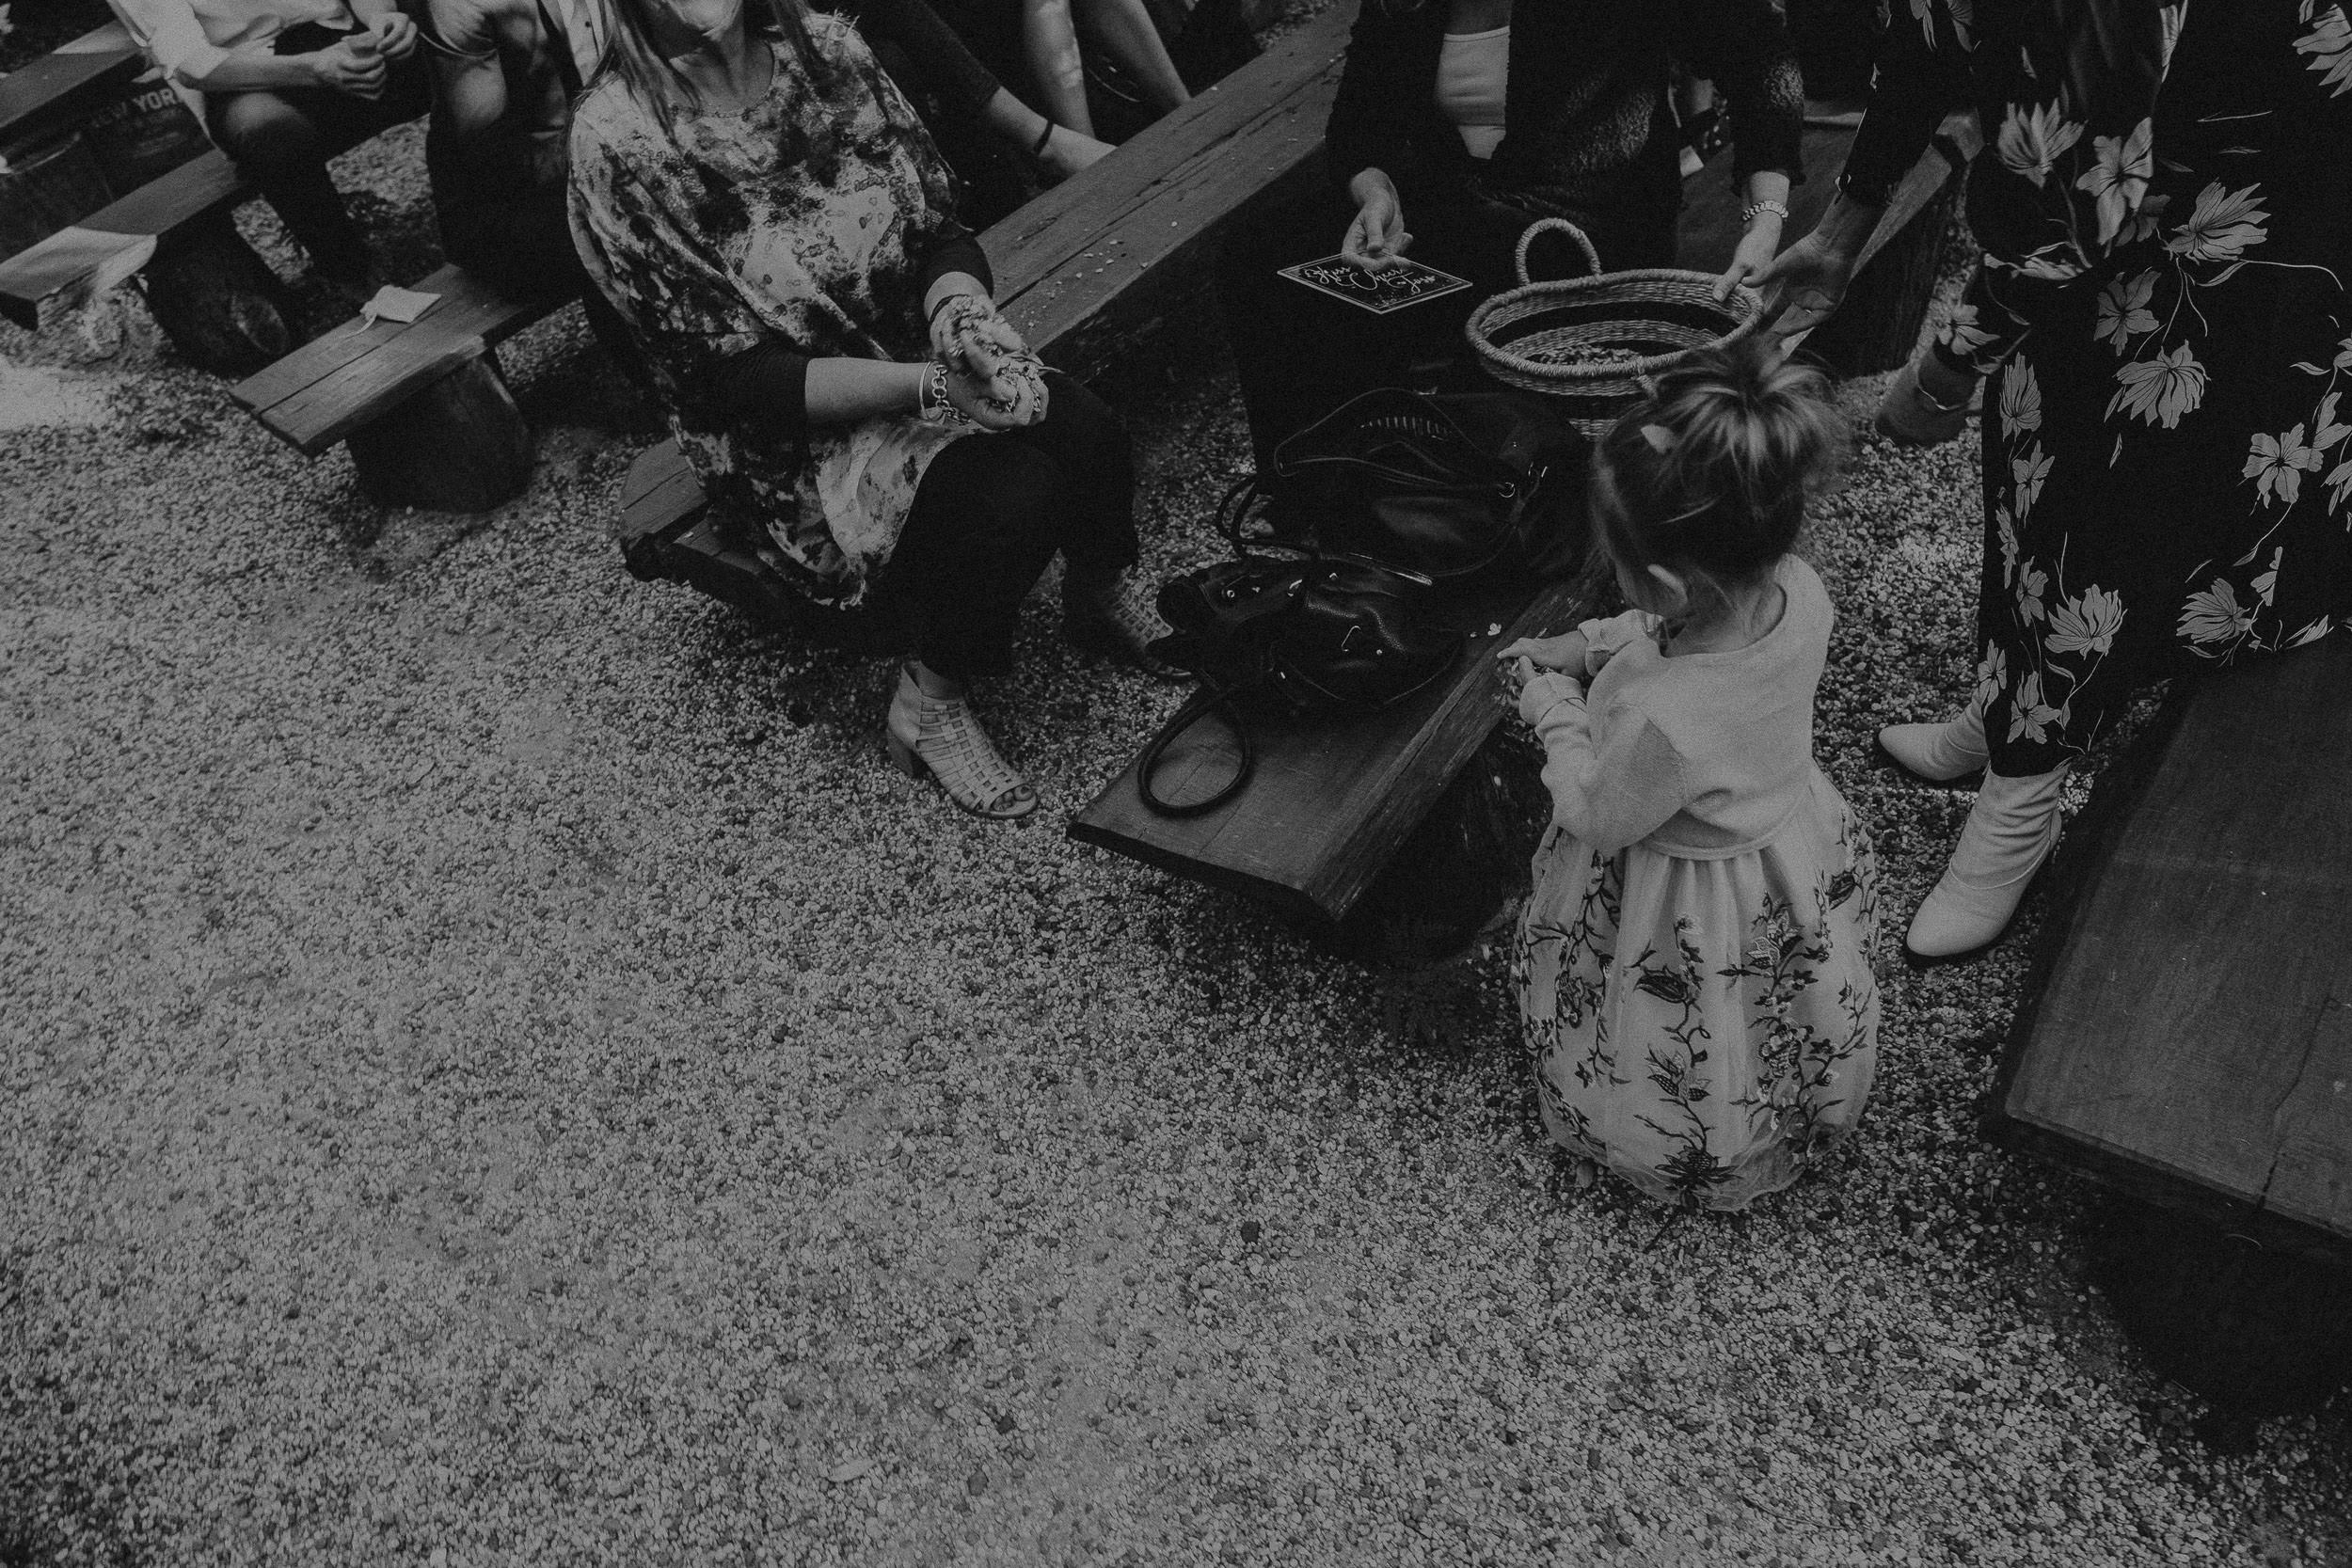 S&A Elopement - Kings & Thieves - Shred 'Til Dead - Central Coast Beach Forest Wedding - 281.jpg